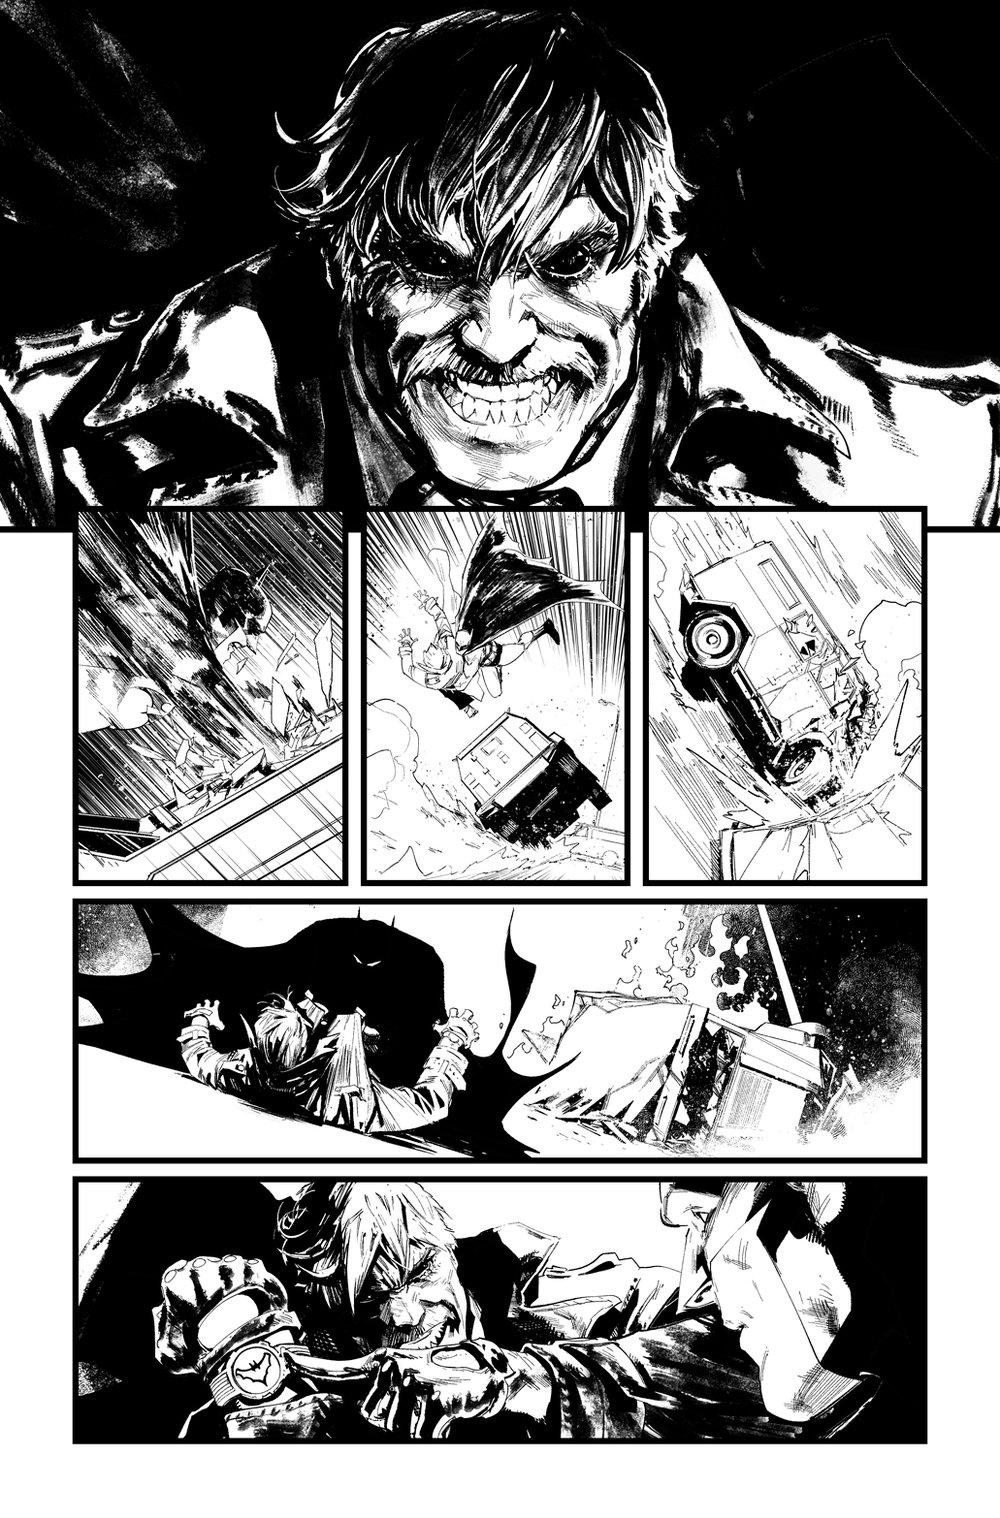 Image of BATMAN/SUPERMAN #3 p.11 ARTIST'S PROOF